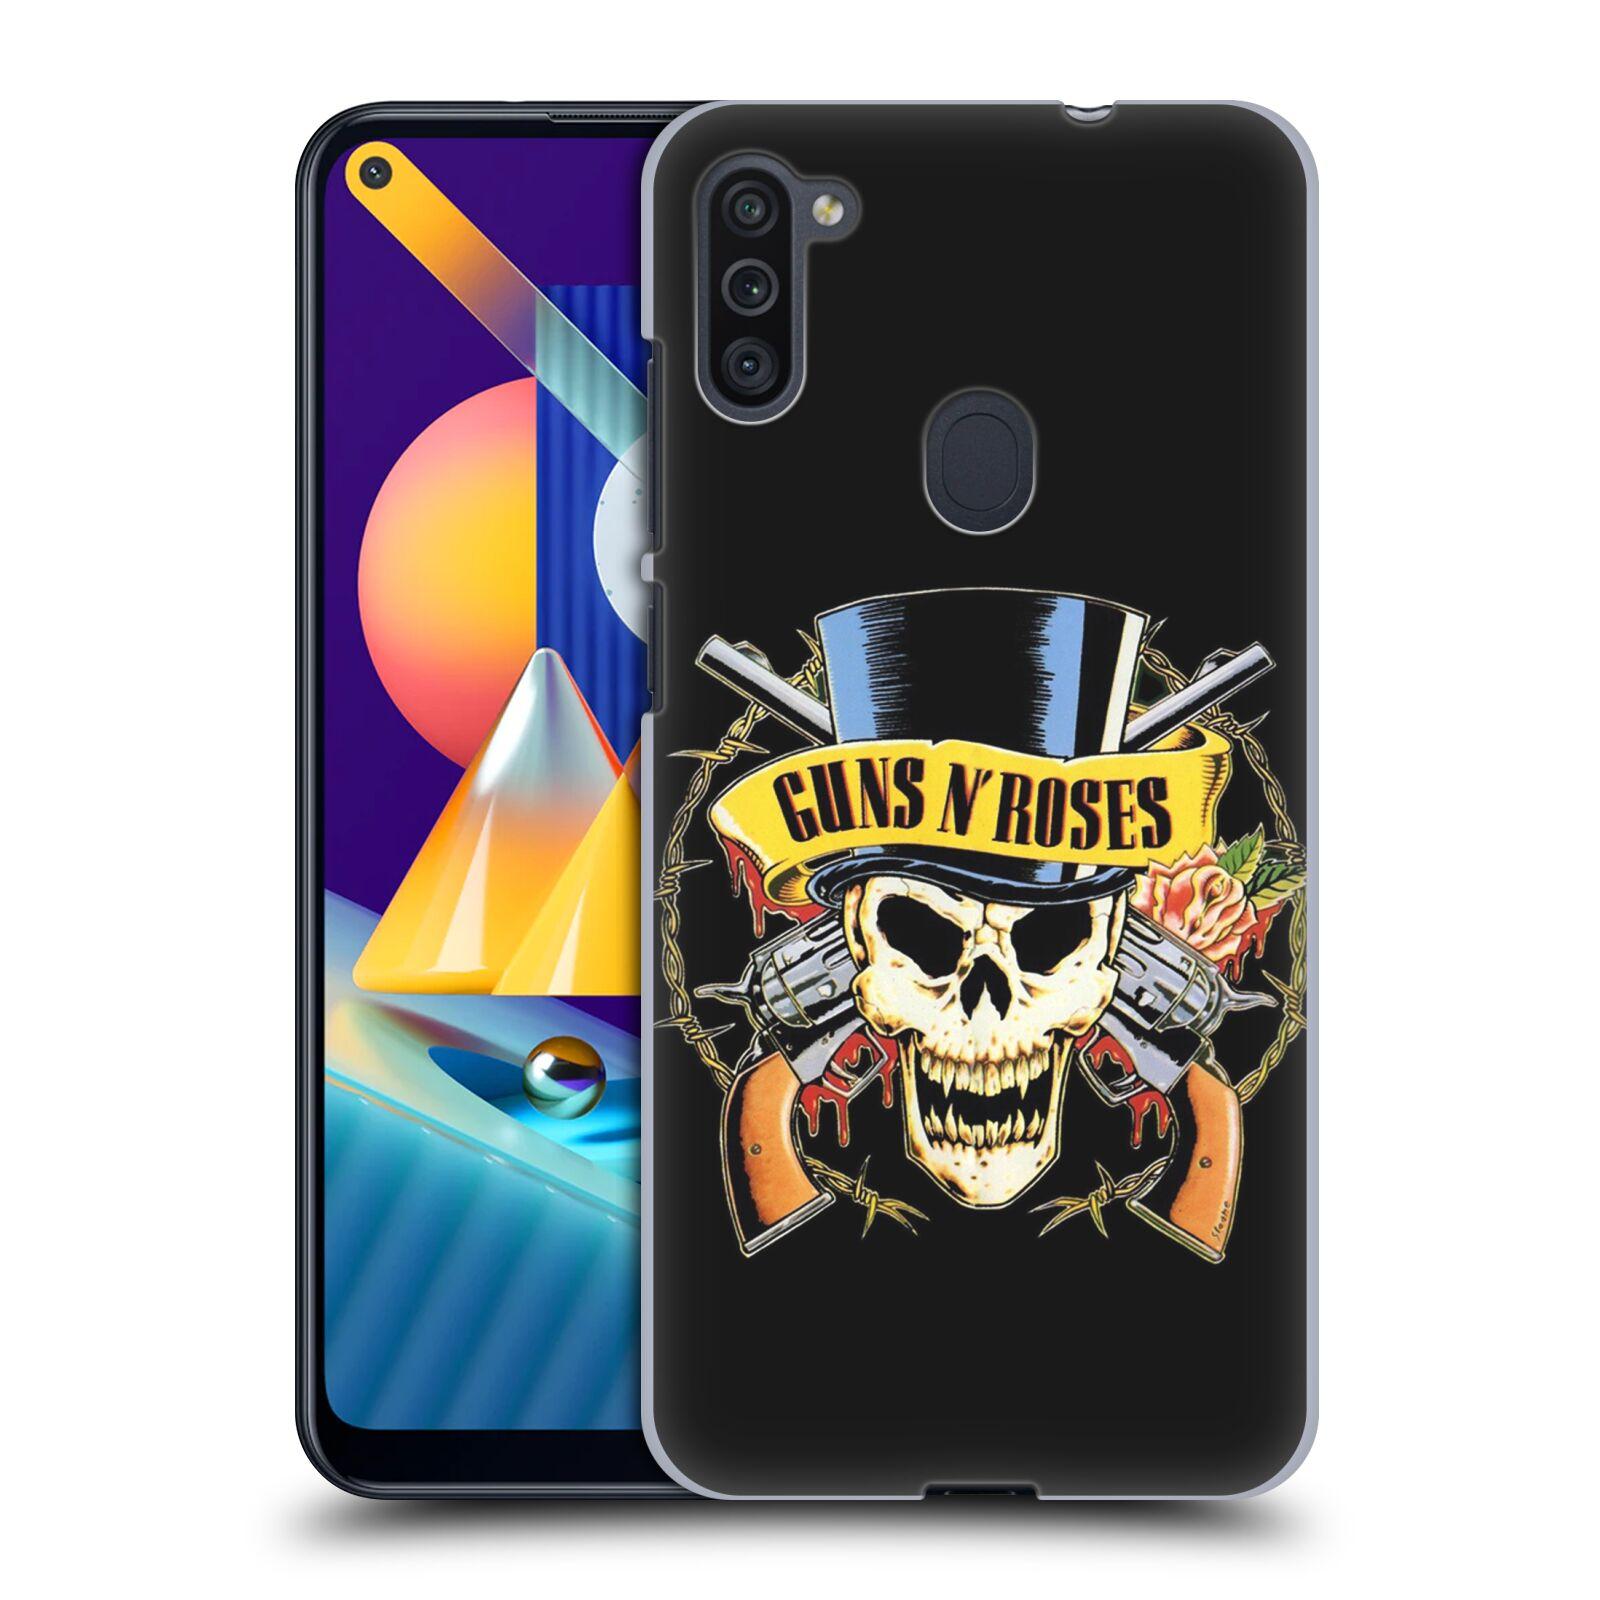 Plastové pouzdro na mobil Samsung Galaxy M11 - Head Case - Guns N' Roses - Lebka